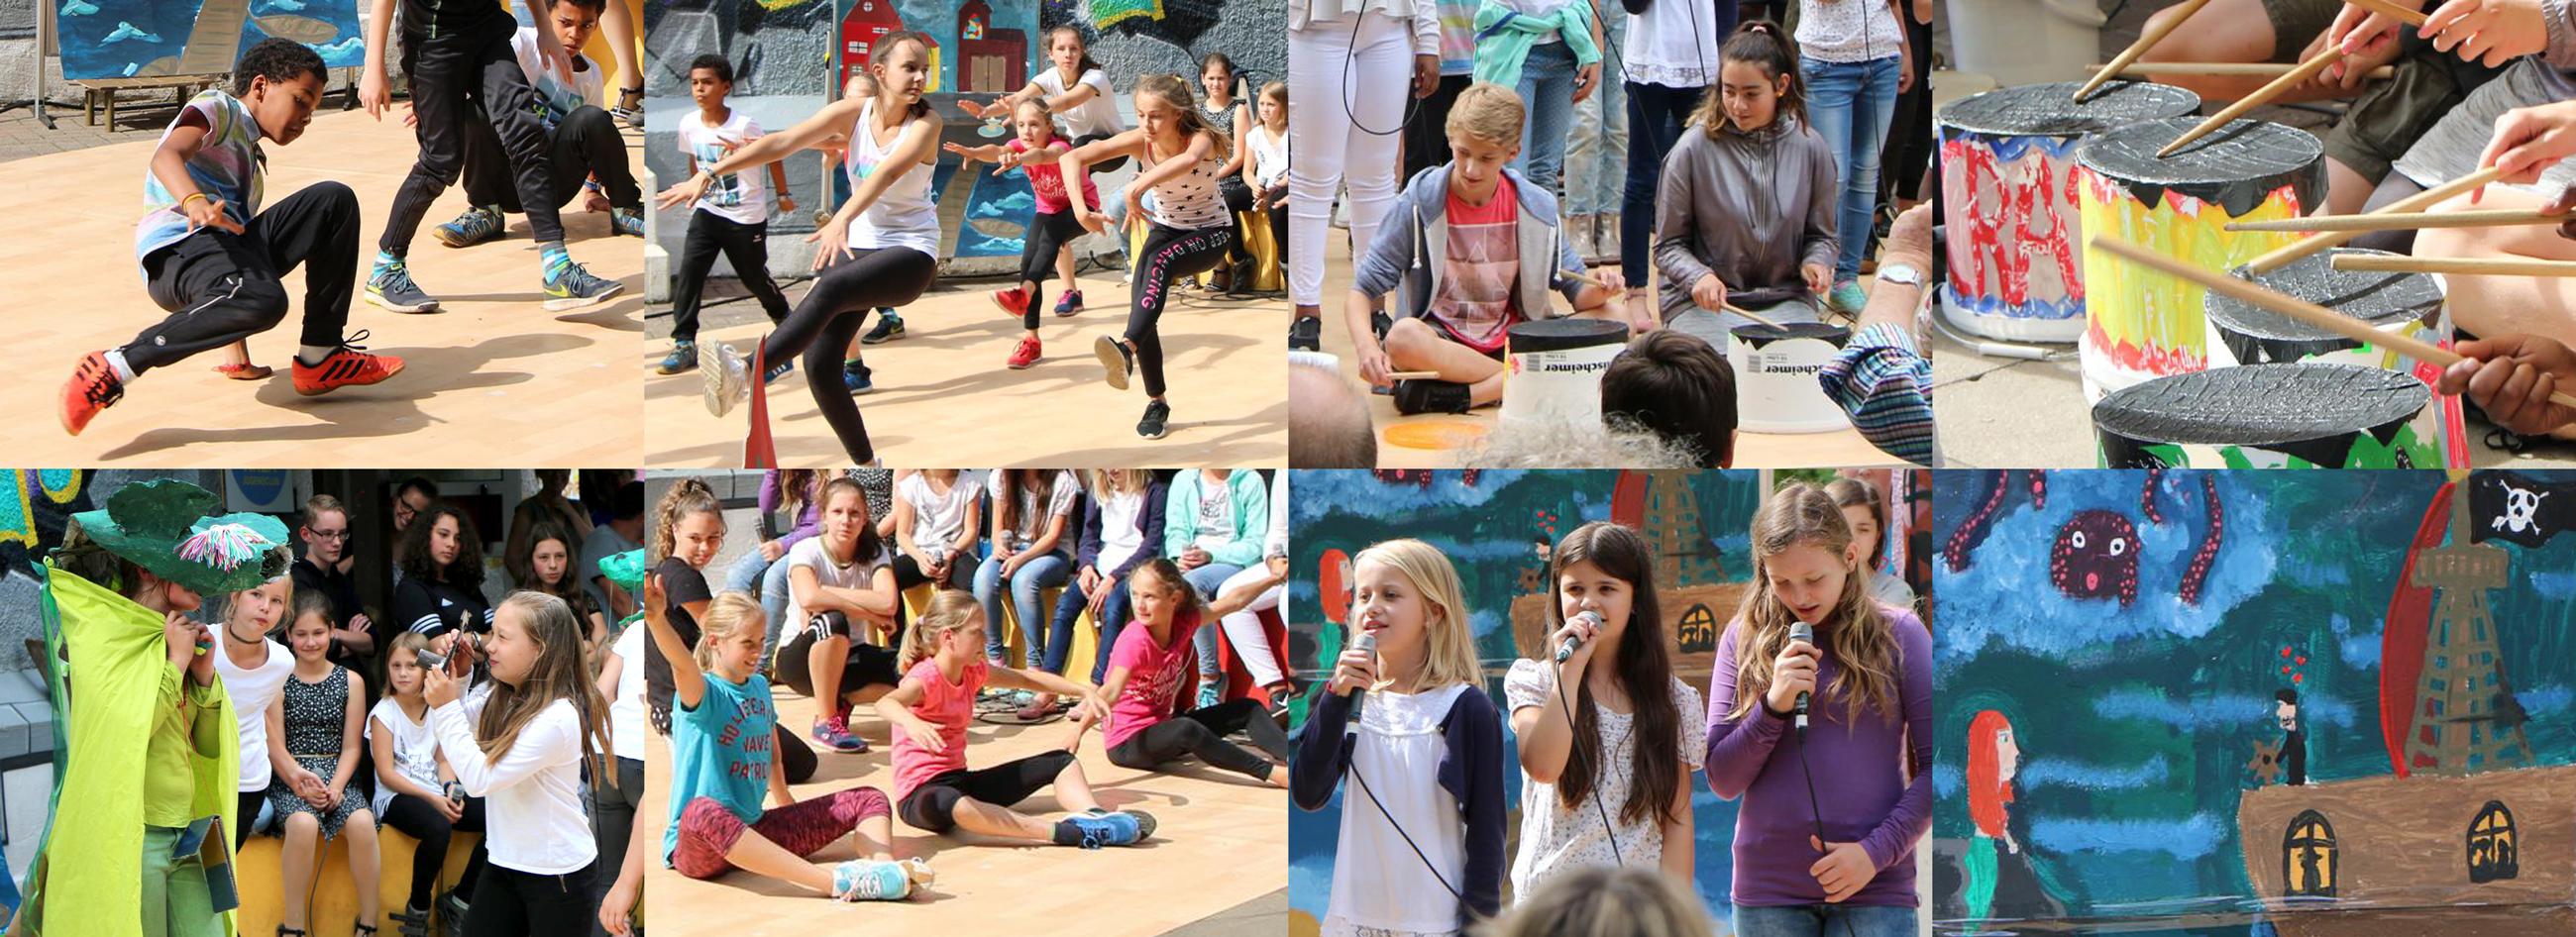 Krea Kultur-Ferien Kulturrucksack 2017